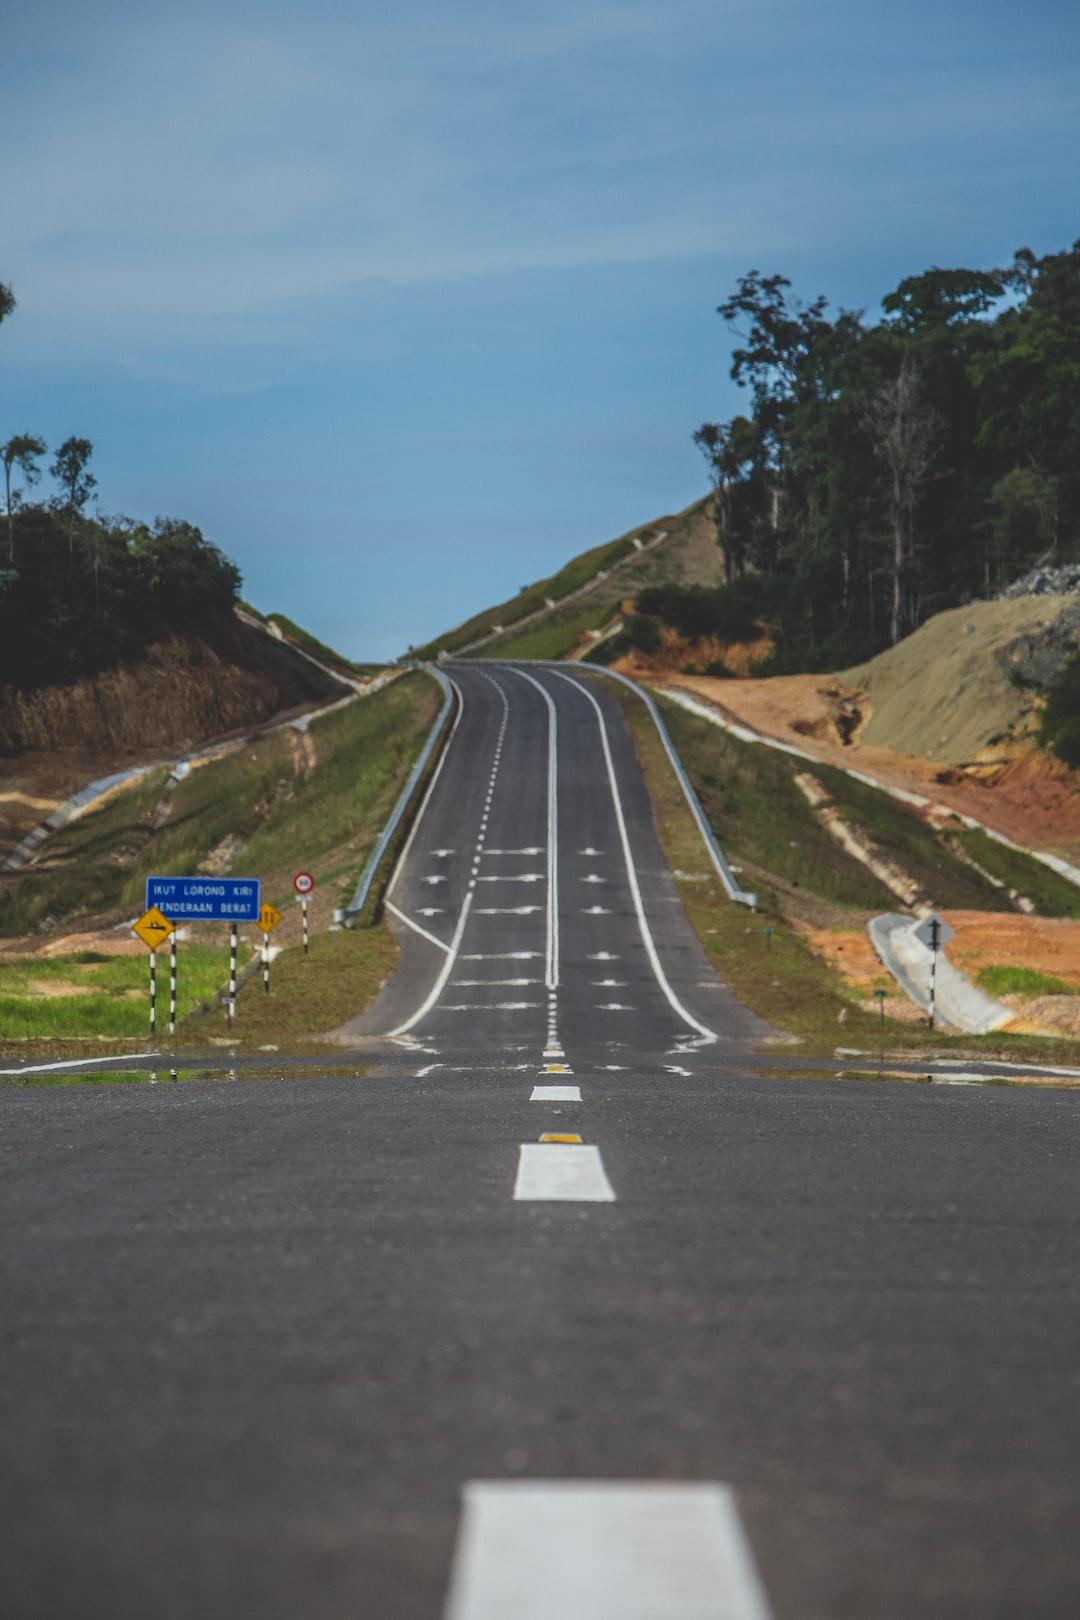 Pan Borneo Highway at Sematan, Sarawak